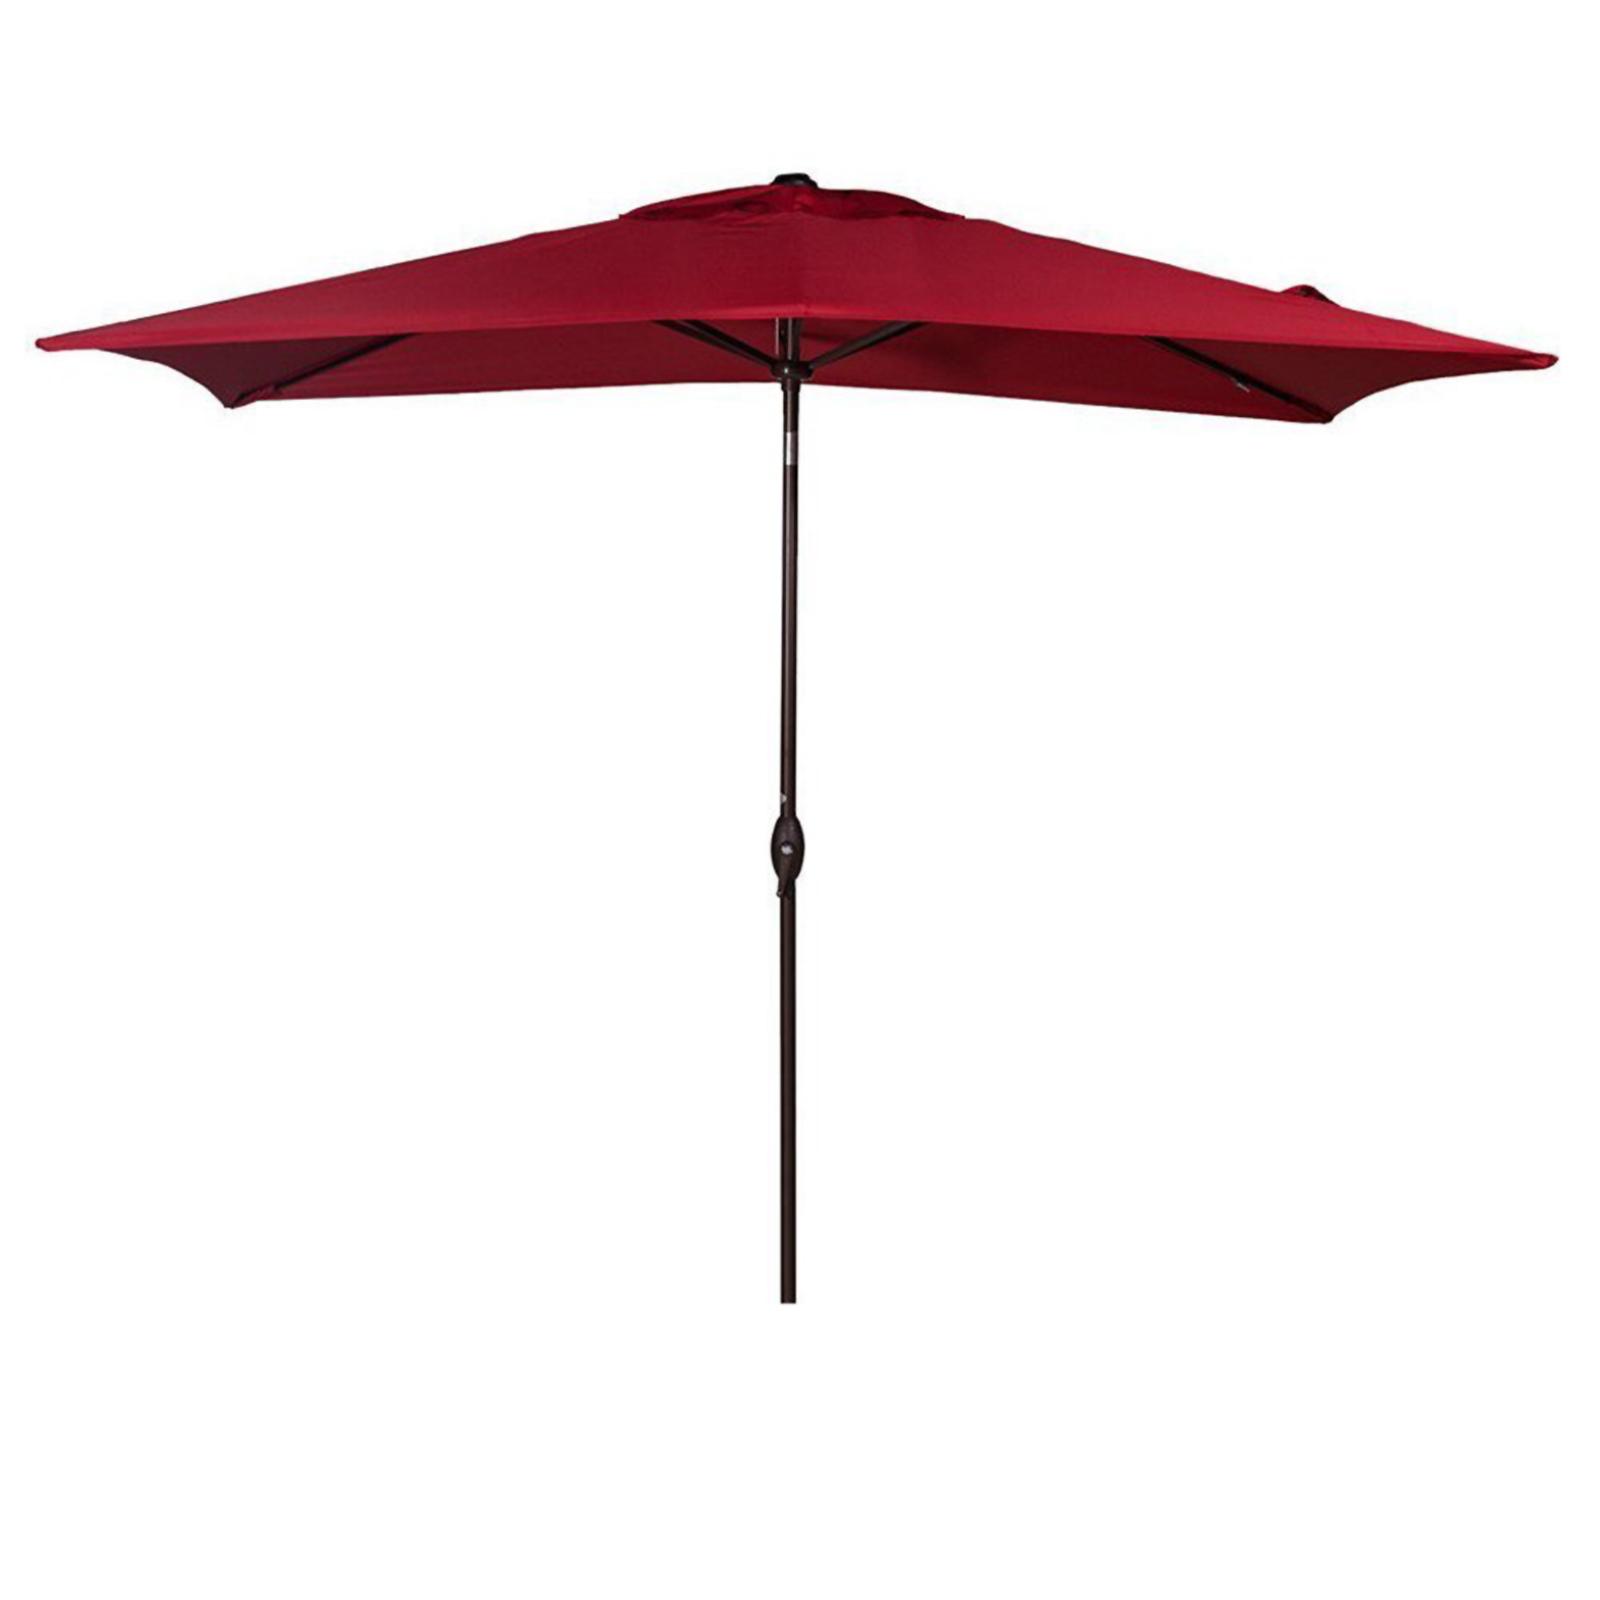 Abba Patio Rectangular Patio Umbrella 6.6 by 9.8-Feet Aluminum Patio Market Outdoor Table Umbrella with Push Button Tilt and Crank, Red PartNumber: SPM4010765521